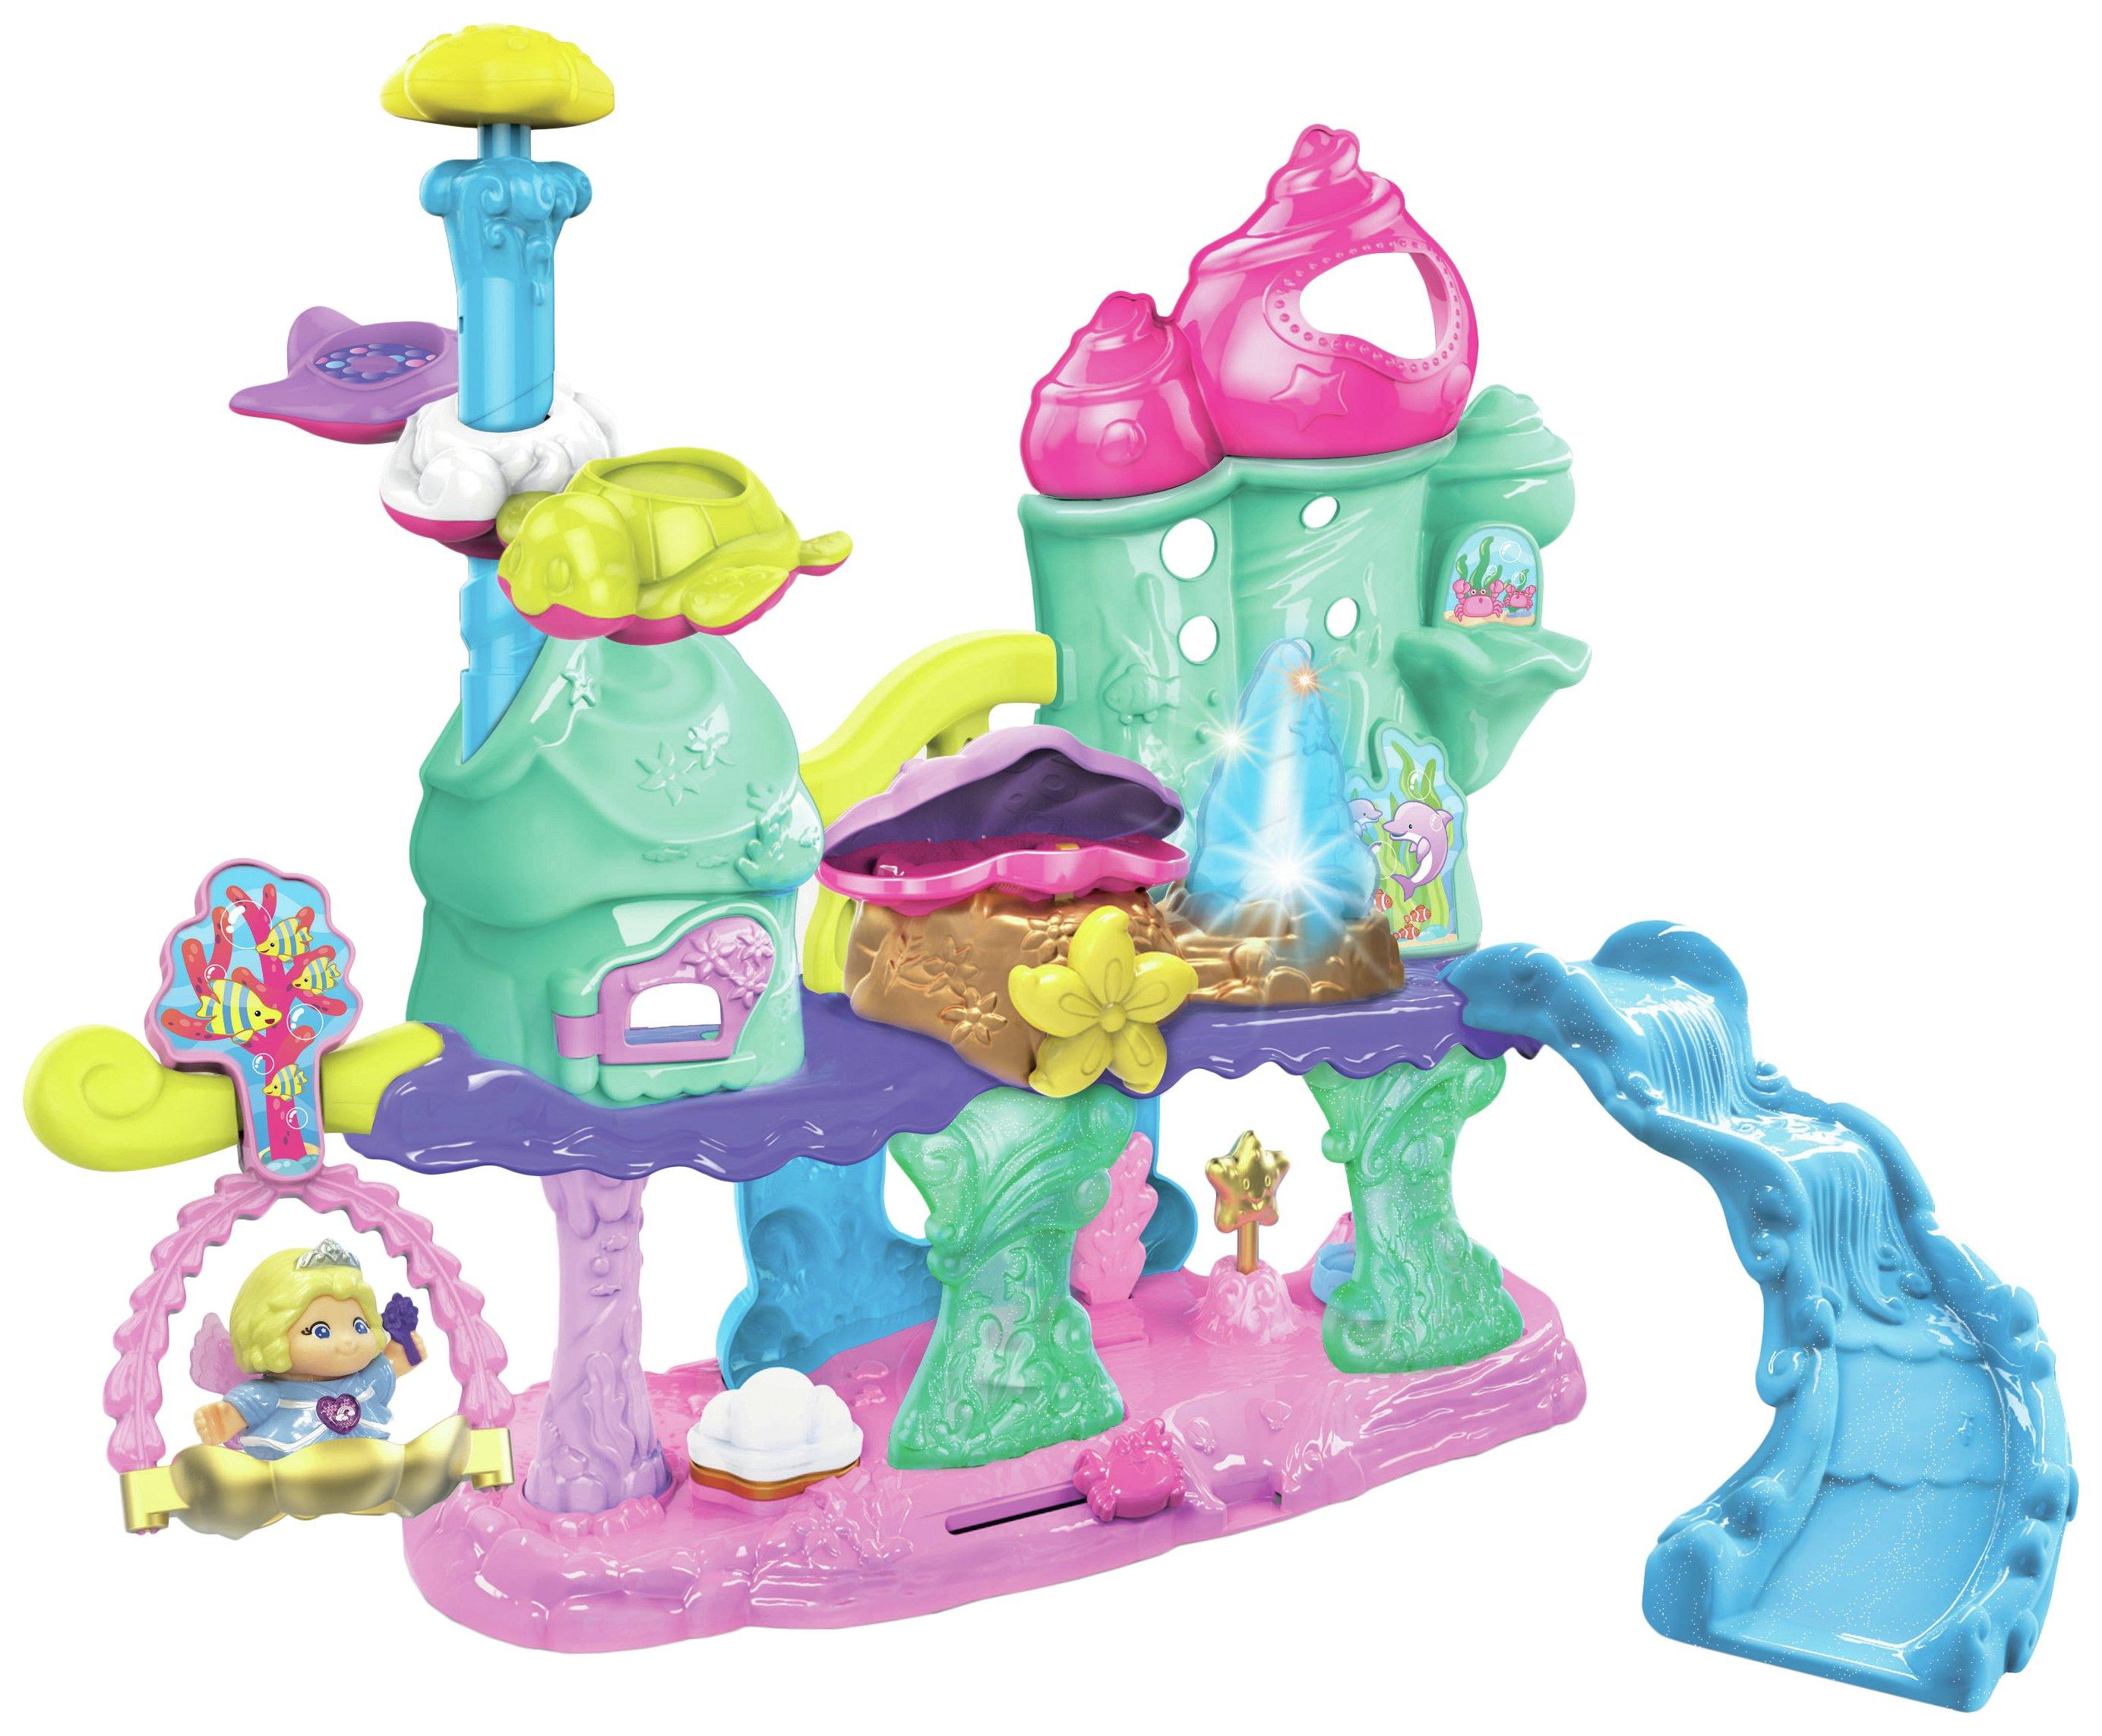 VTech Toot-Toot Kingdom Mermaid Land